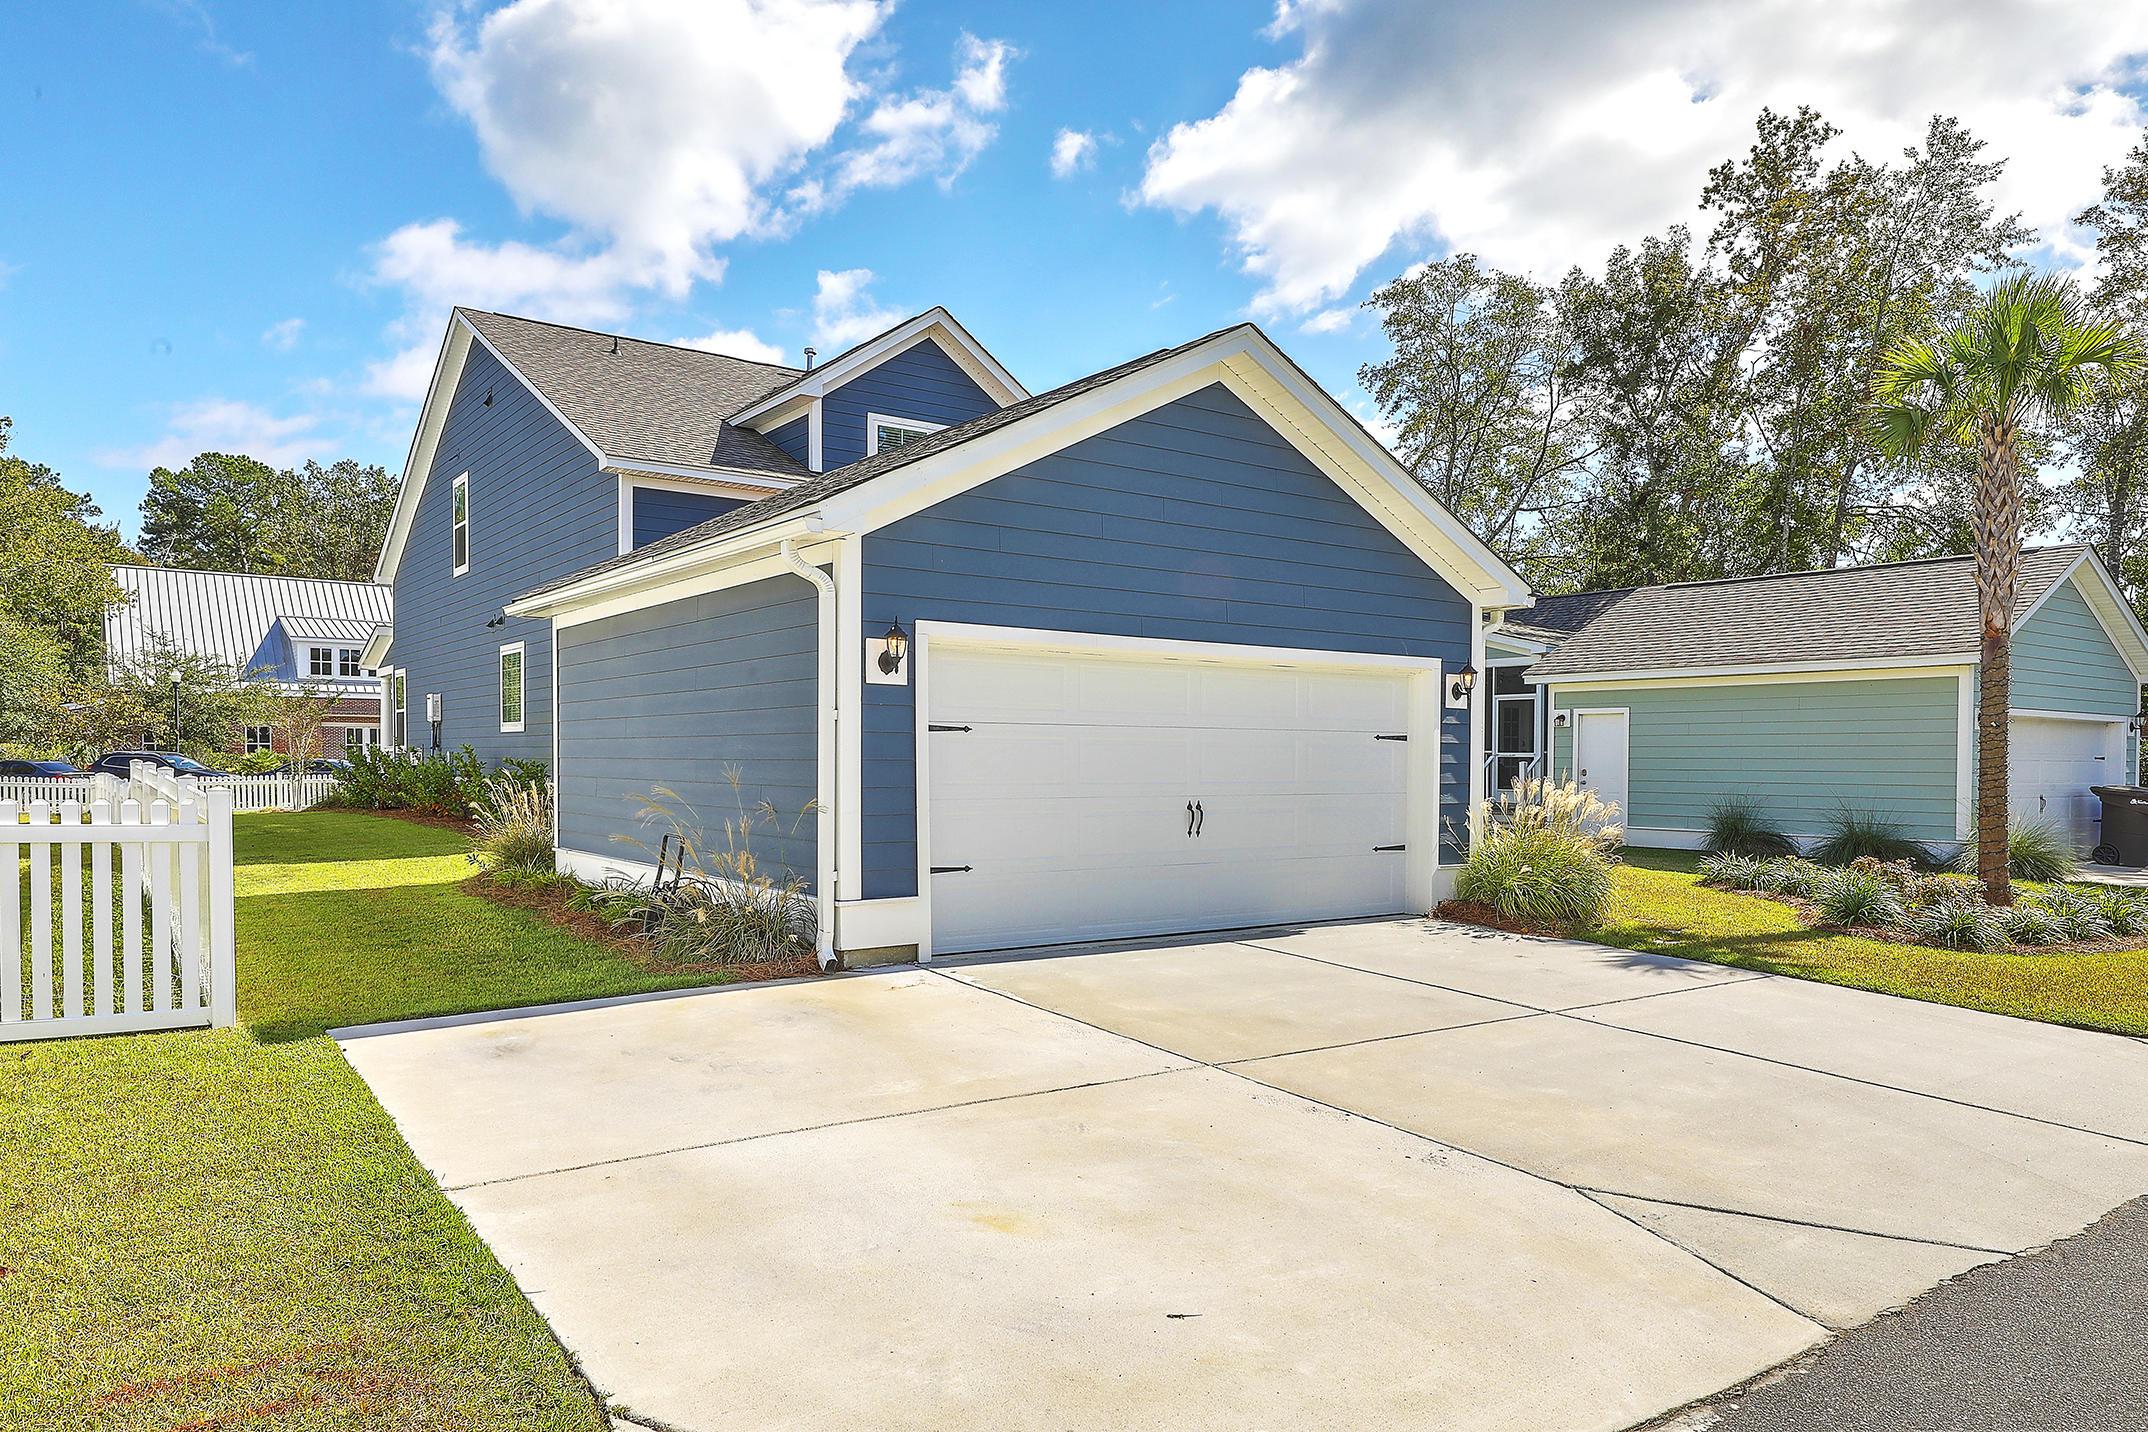 Park West Homes For Sale - 3412 Salterbeck, Mount Pleasant, SC - 29